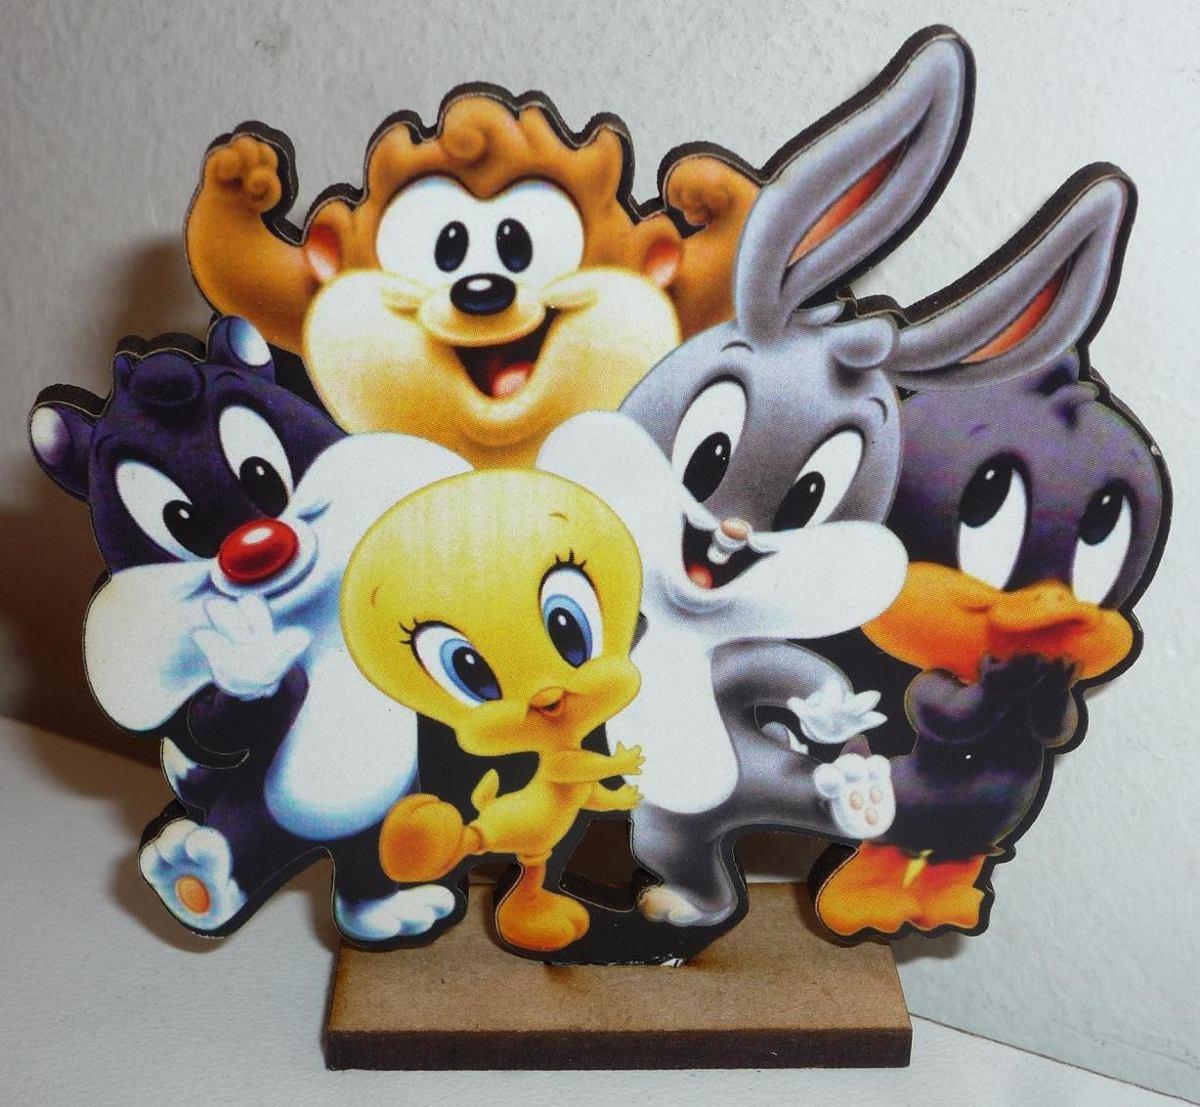 Souvenirs Looney Tunes Bebes  Otros Souvenirs para Cumpleaos